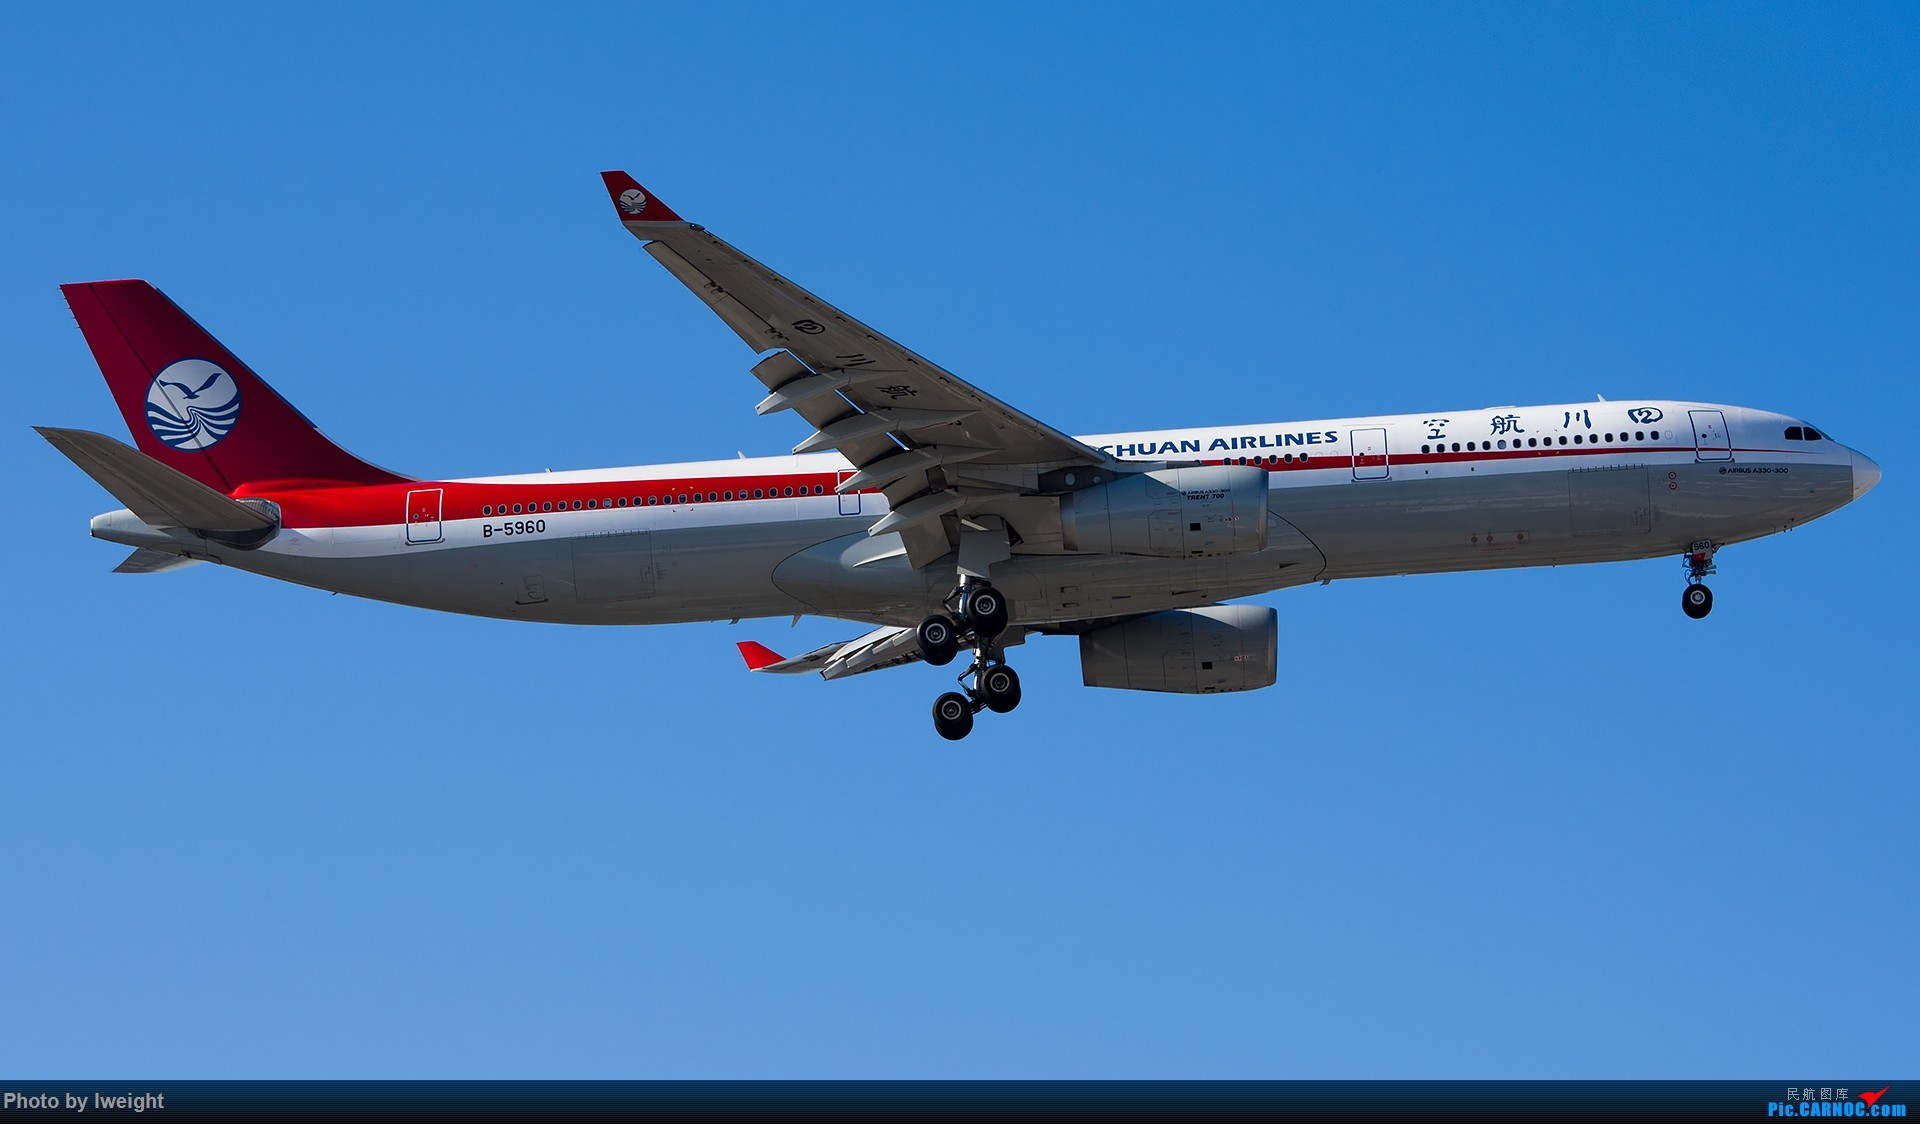 Re:[原创]终于在12月的北京等到了一个晴天的周末,出来拍拍飞机【2015-12-5】 AIRBUS A330-300 B-5960 中国北京首都国际机场